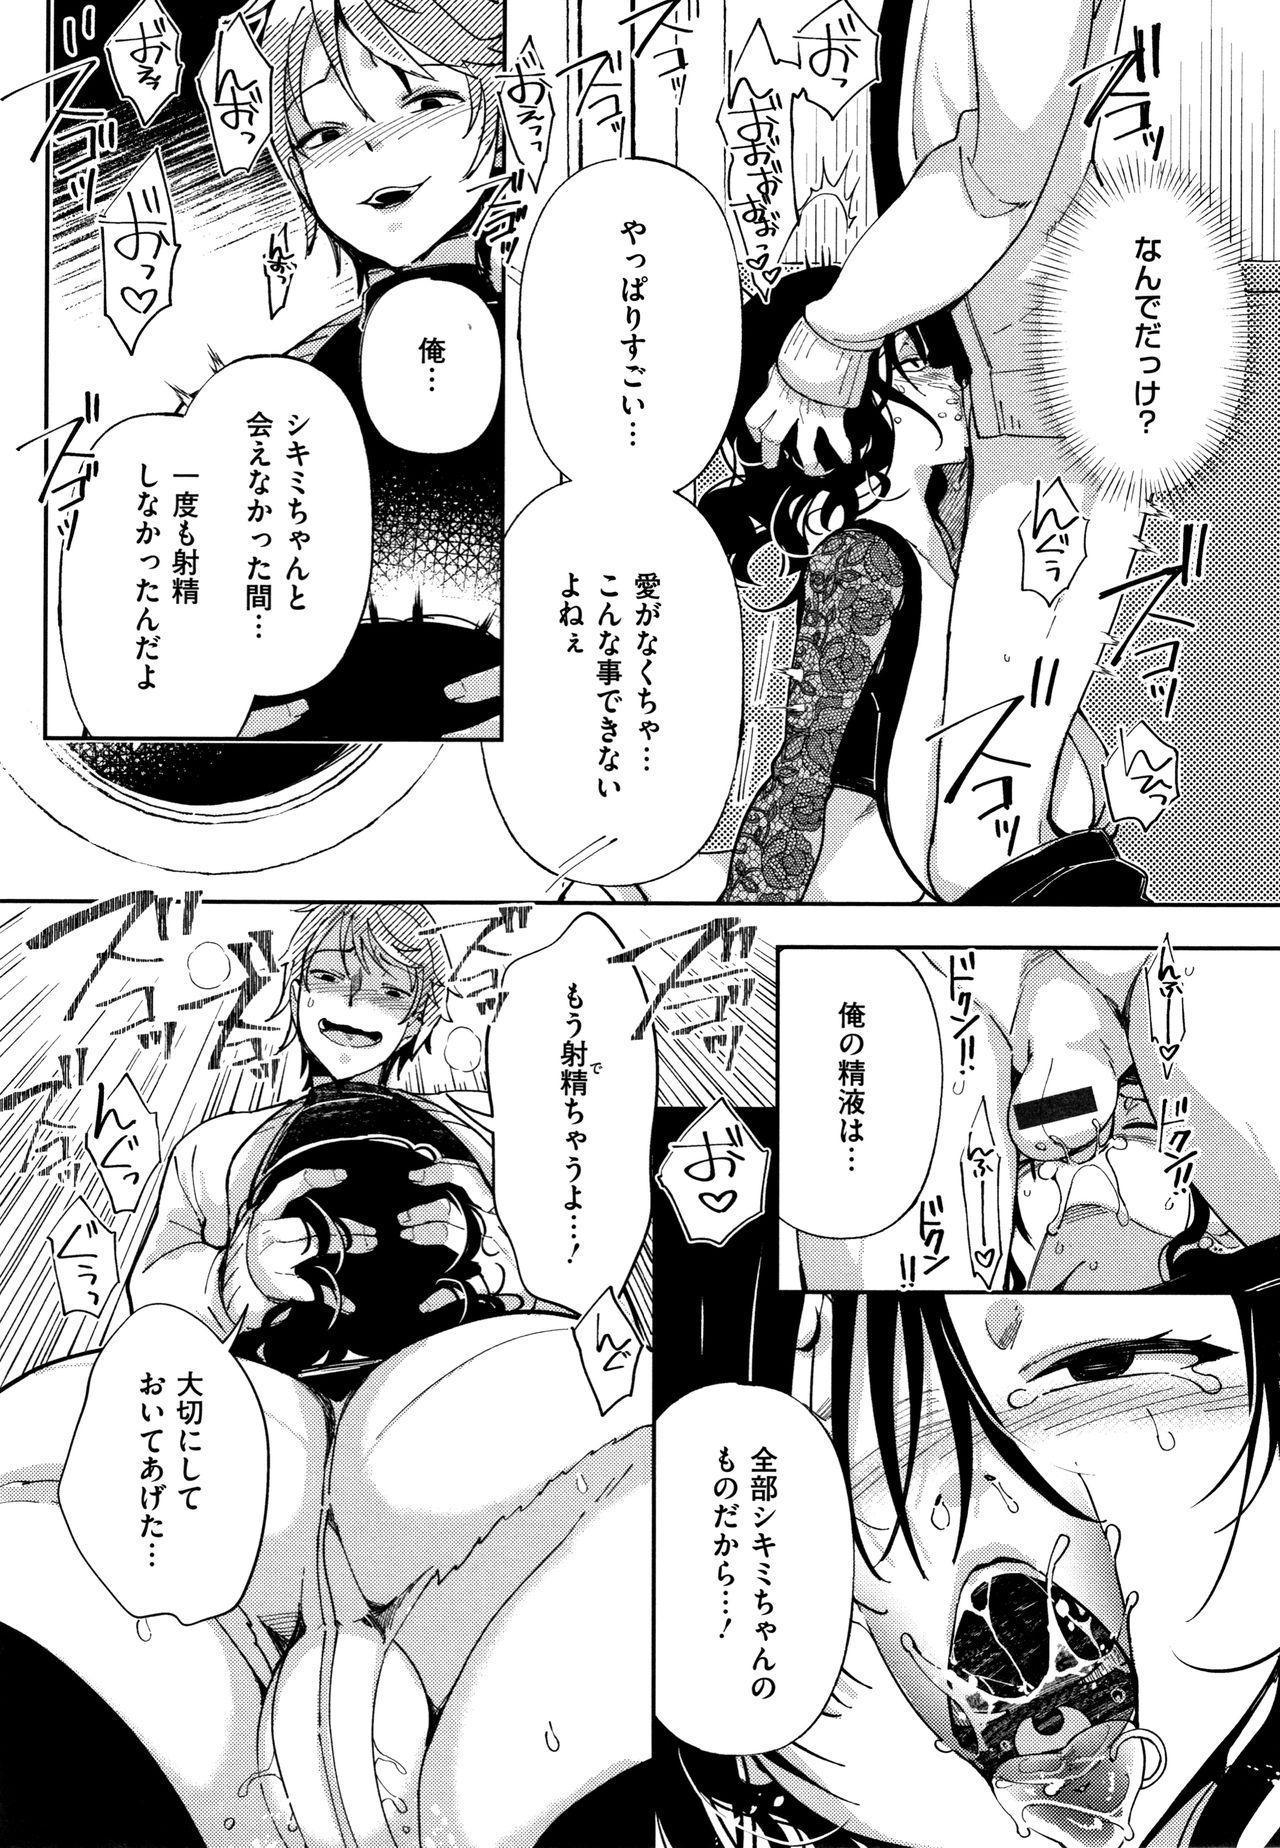 Saijaku Gal wa Ikizurai! - The weakest pussy is hard to go. 135